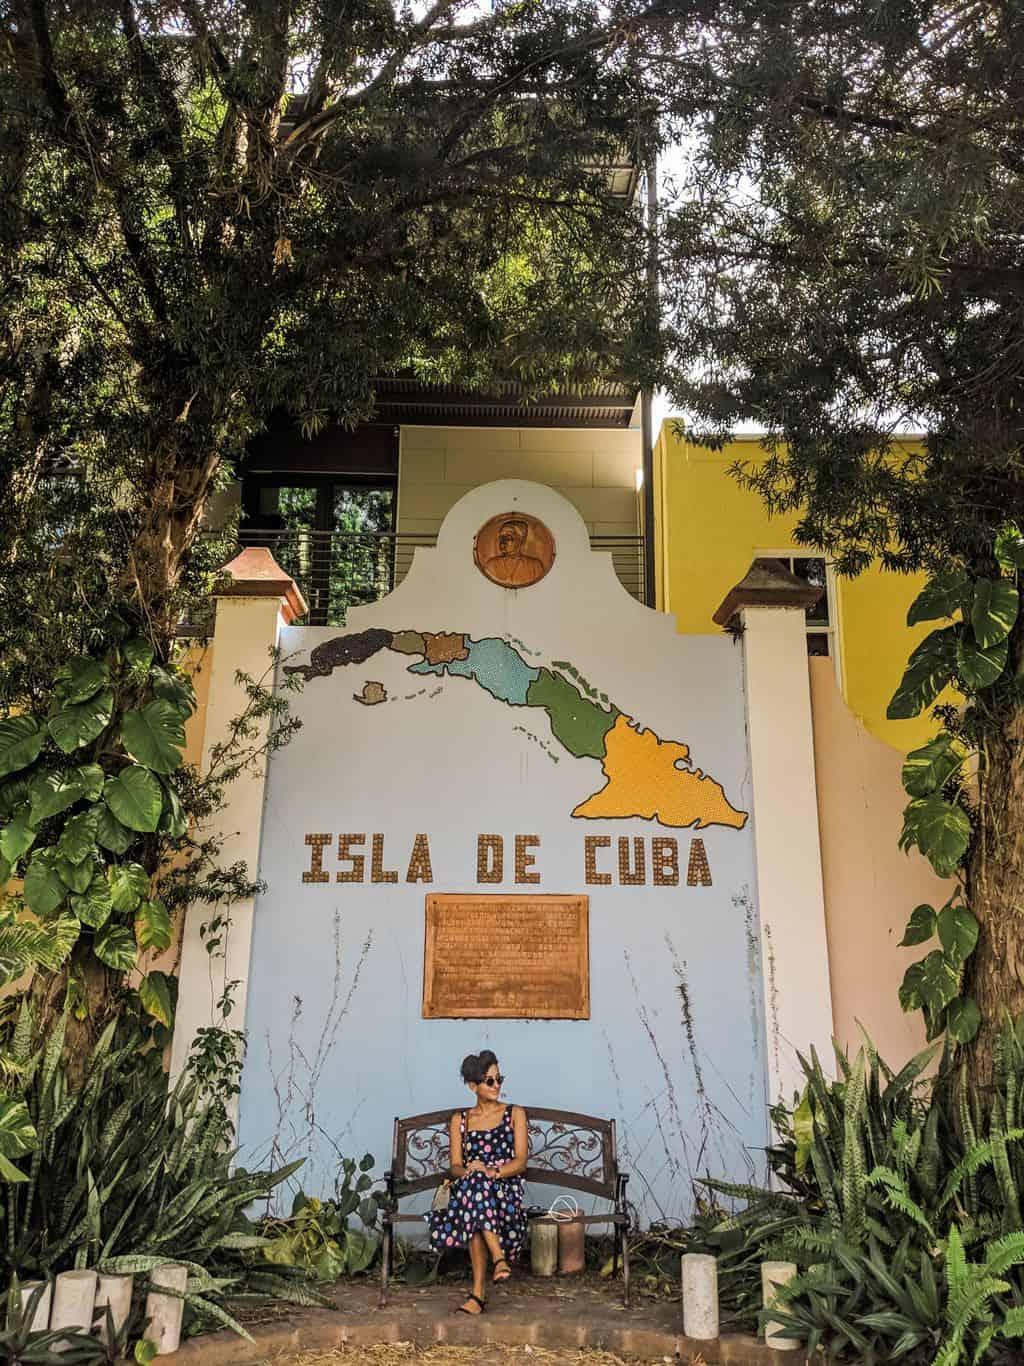 José Martí Park Ybor City FL Tampa Bay